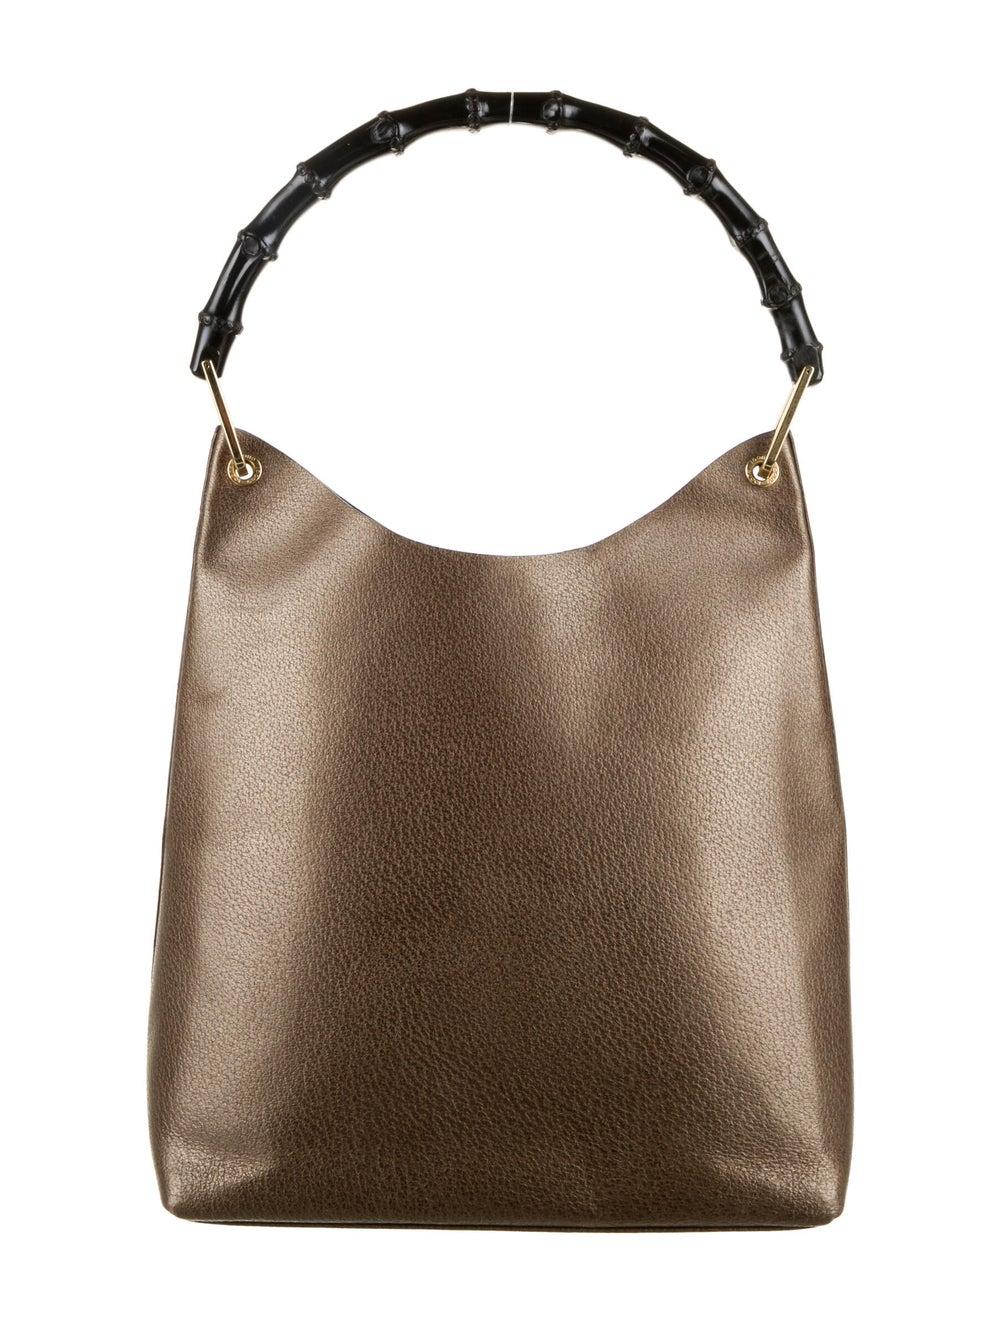 Gucci Bamboo Handle Leather Hobo Brown - image 4